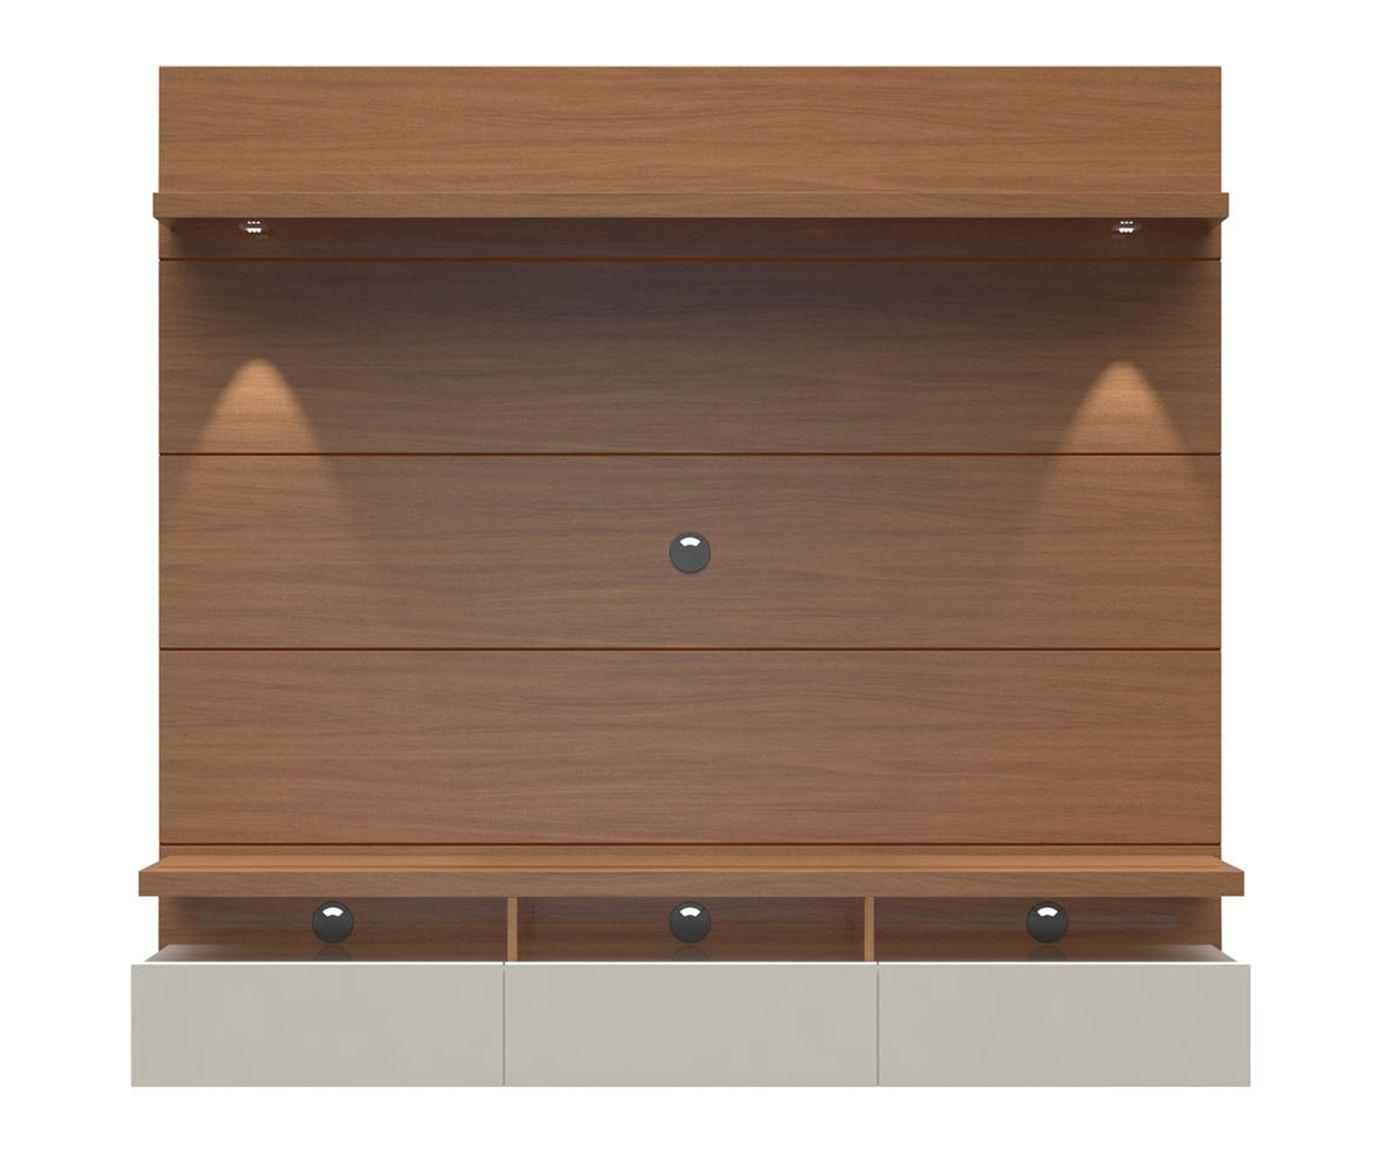 Home Horizon Off White - 181X171X43,5cm | Westwing.com.br